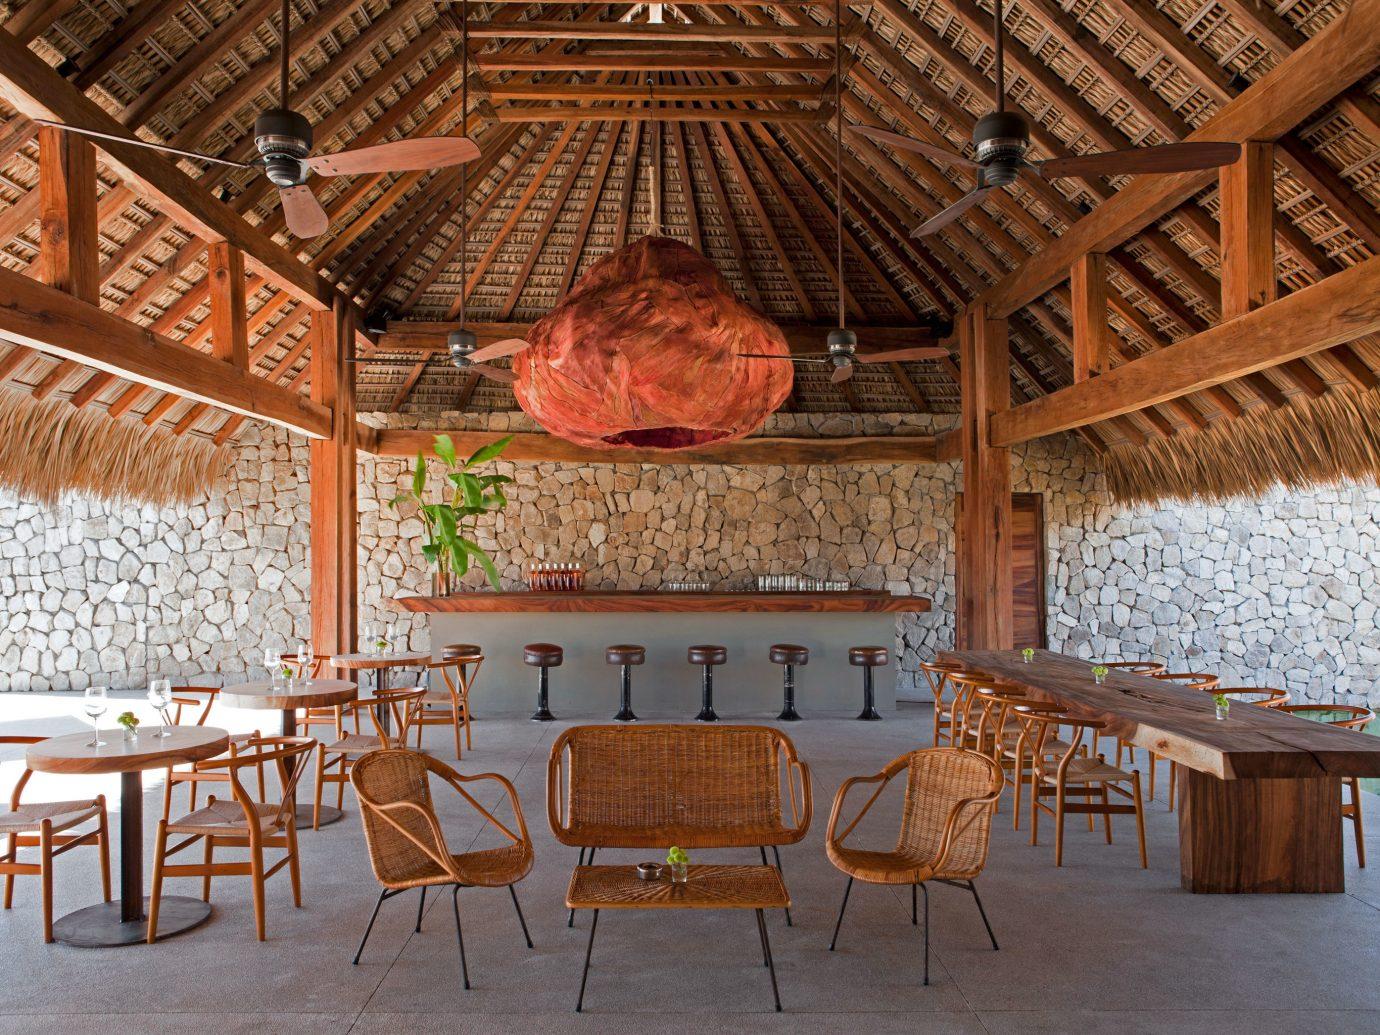 Outdoor dining at Hotel Escondido, Puerto Escondido, Mexico